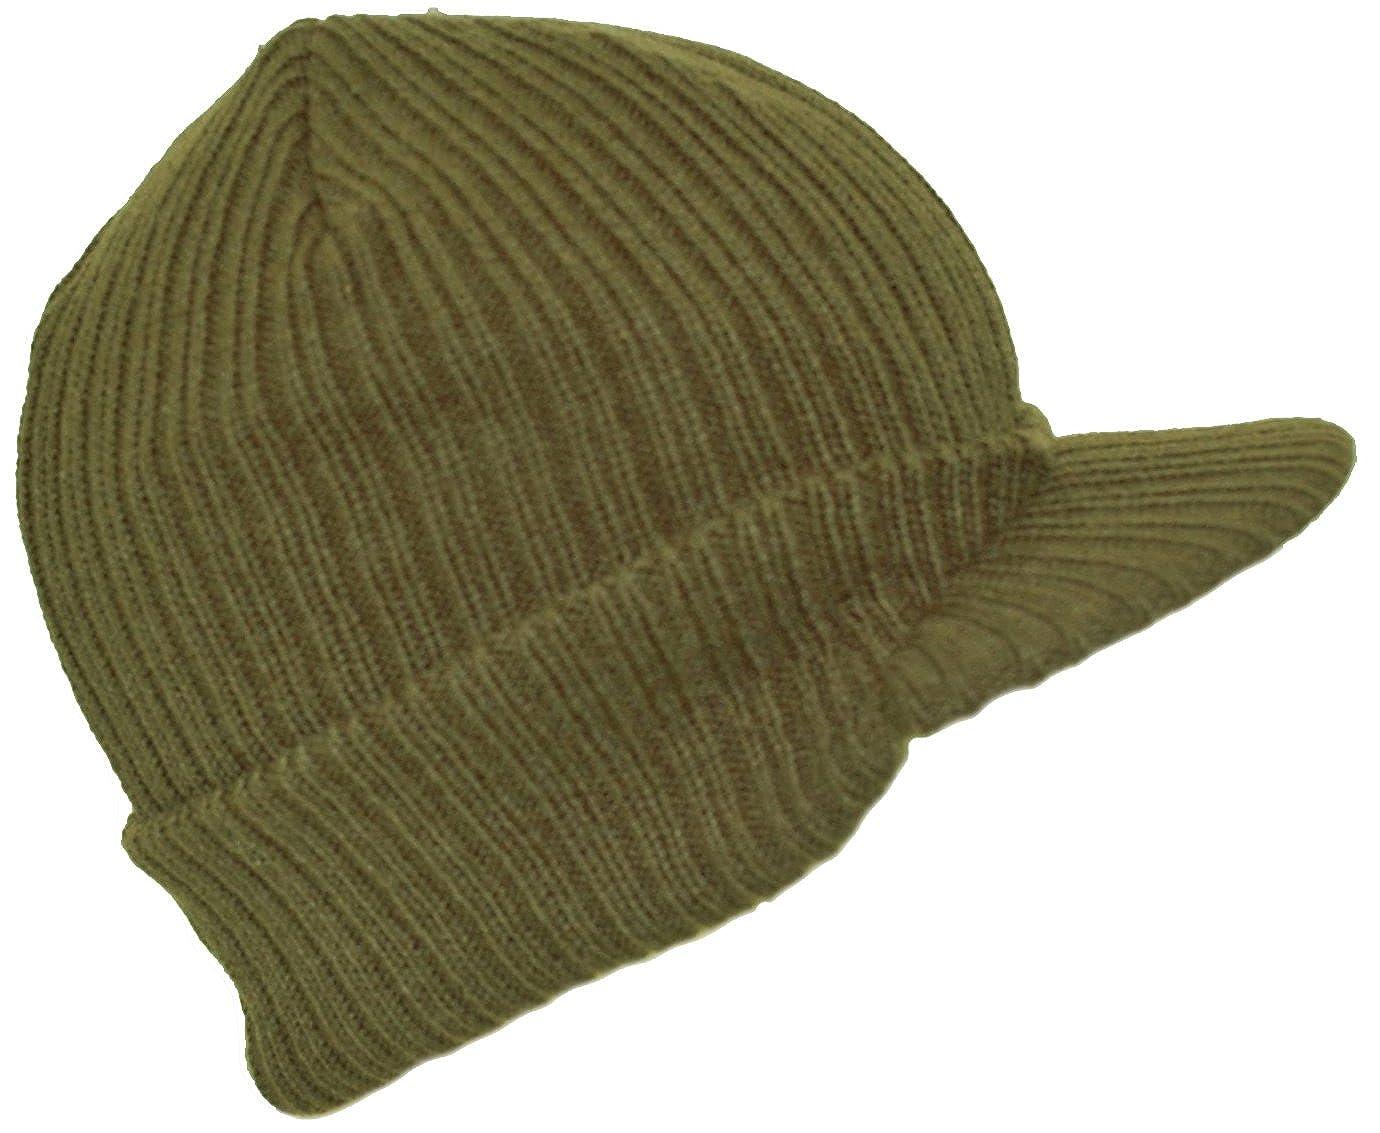 1c13ca947b2 Winter Warm Knitted Tinsulate Peaked Beanie Hat